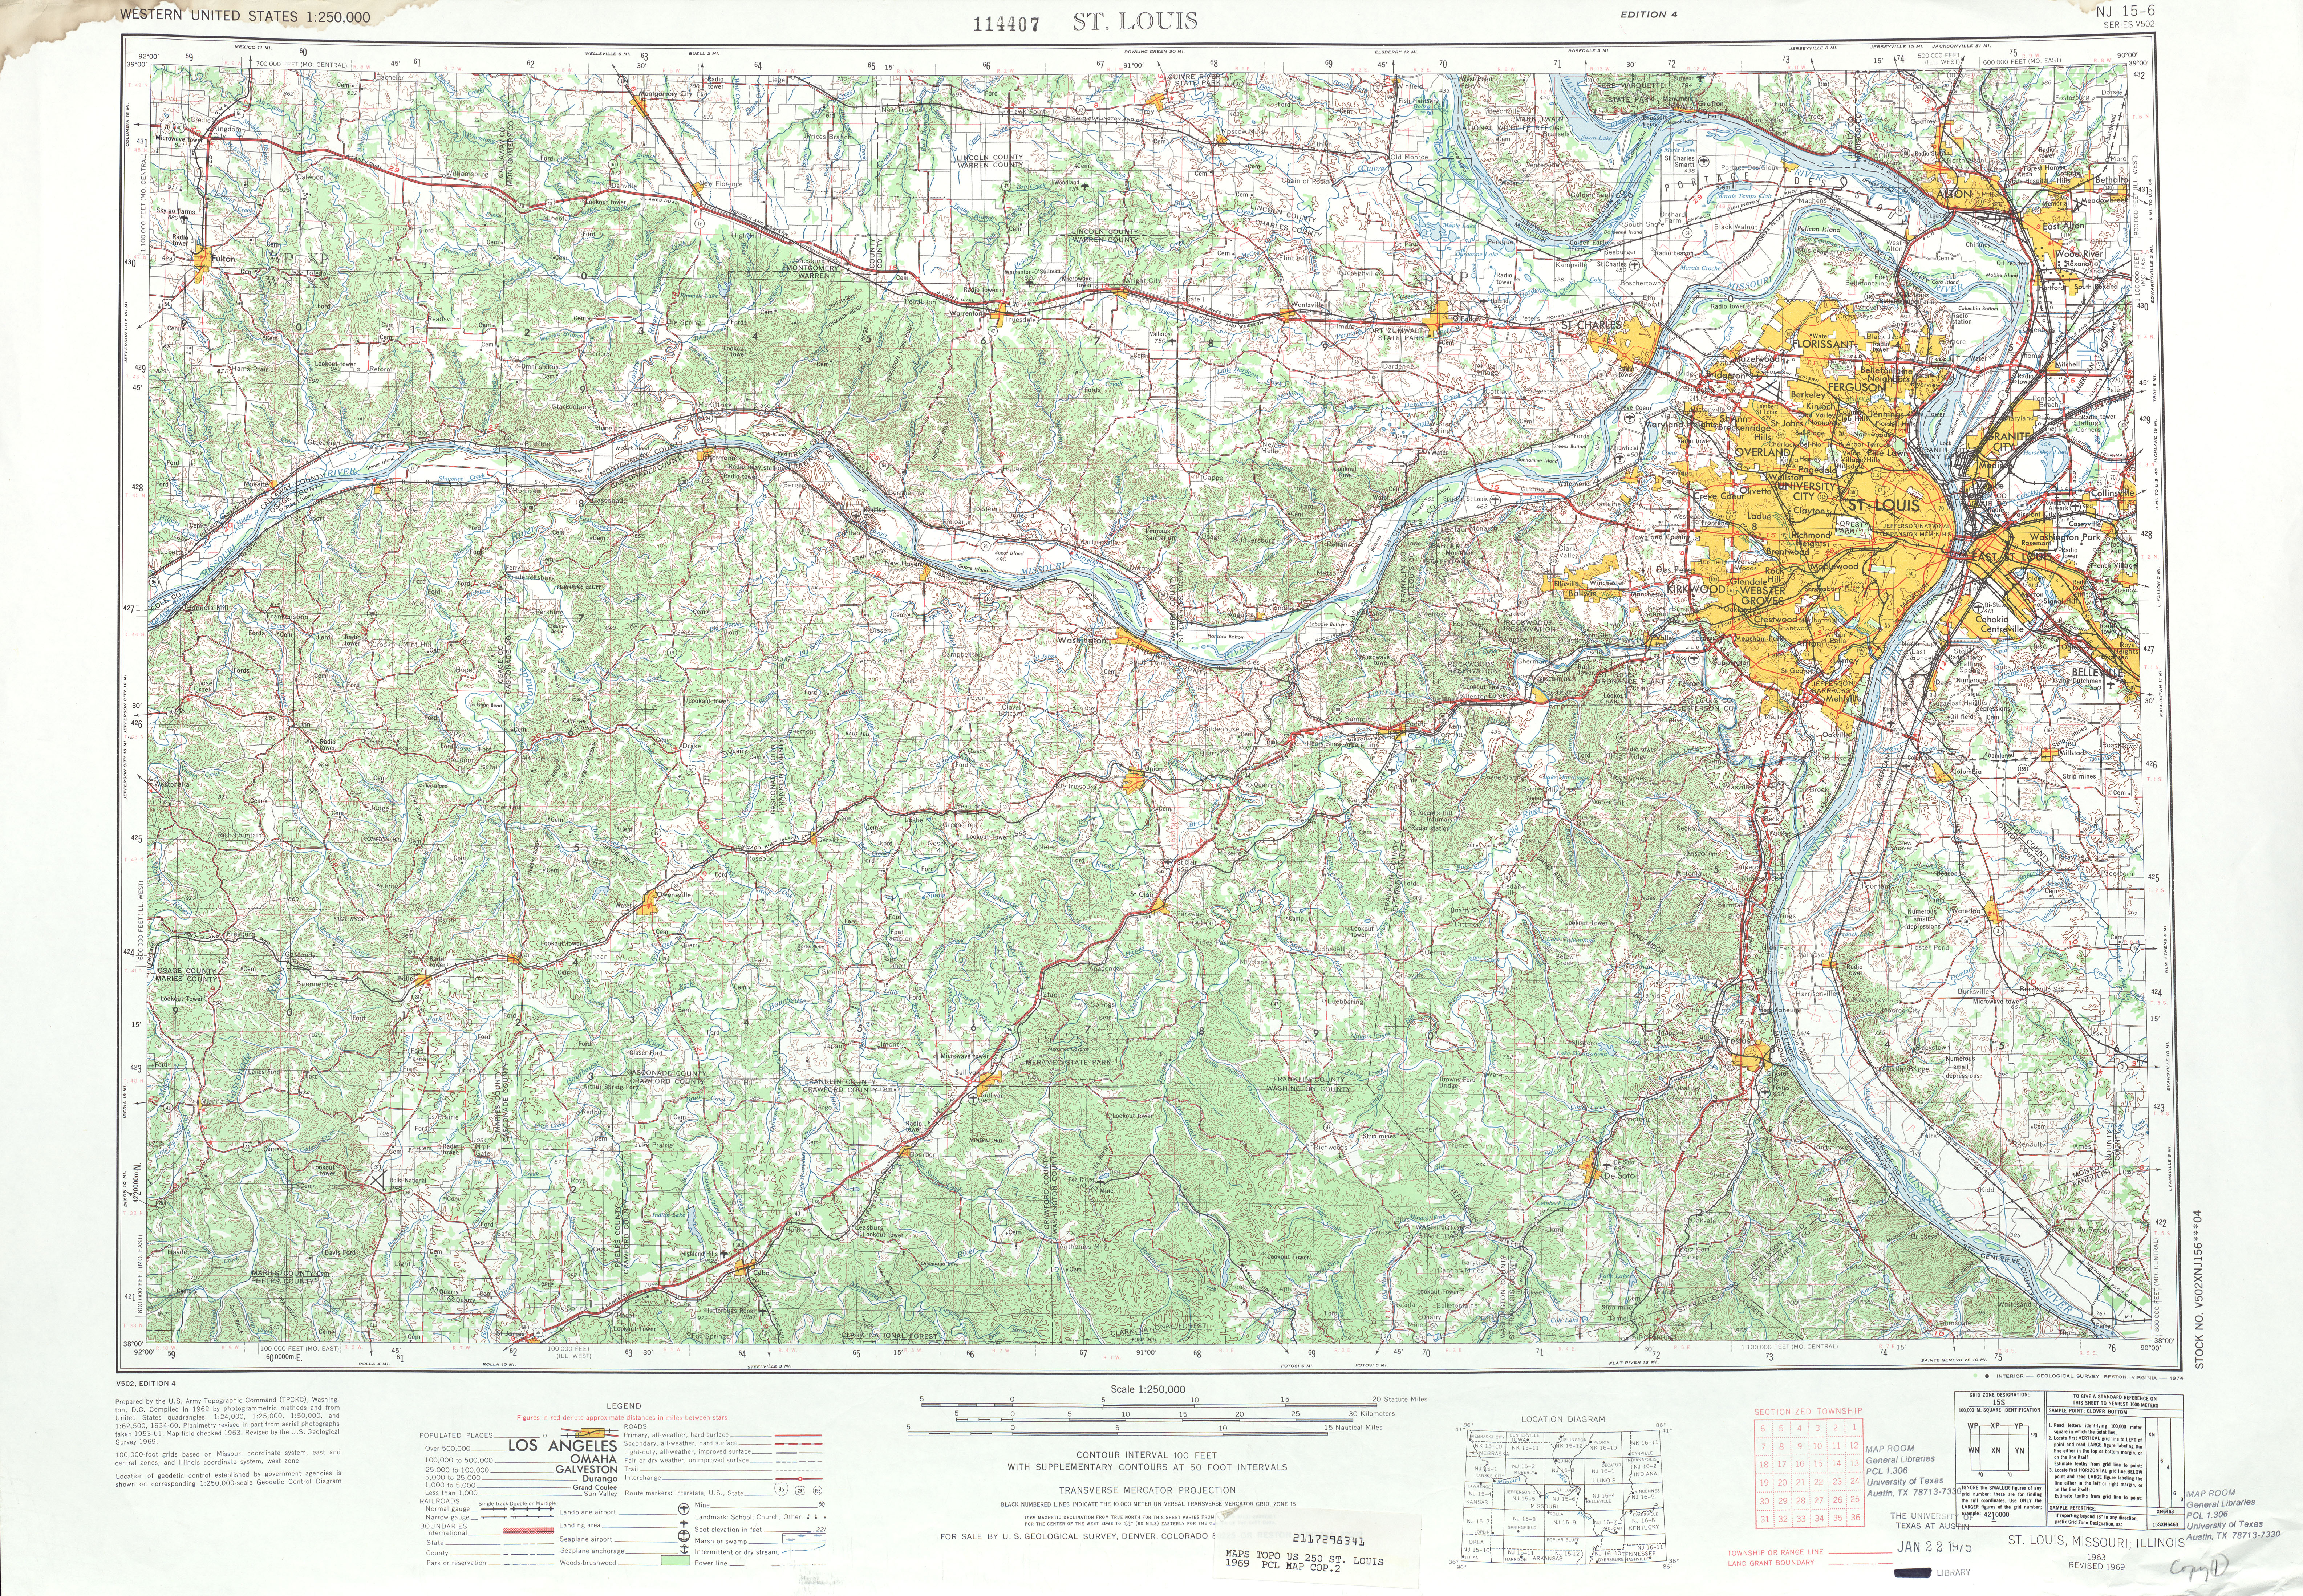 Saint Louis Topographic Map Sheet, United States 1969